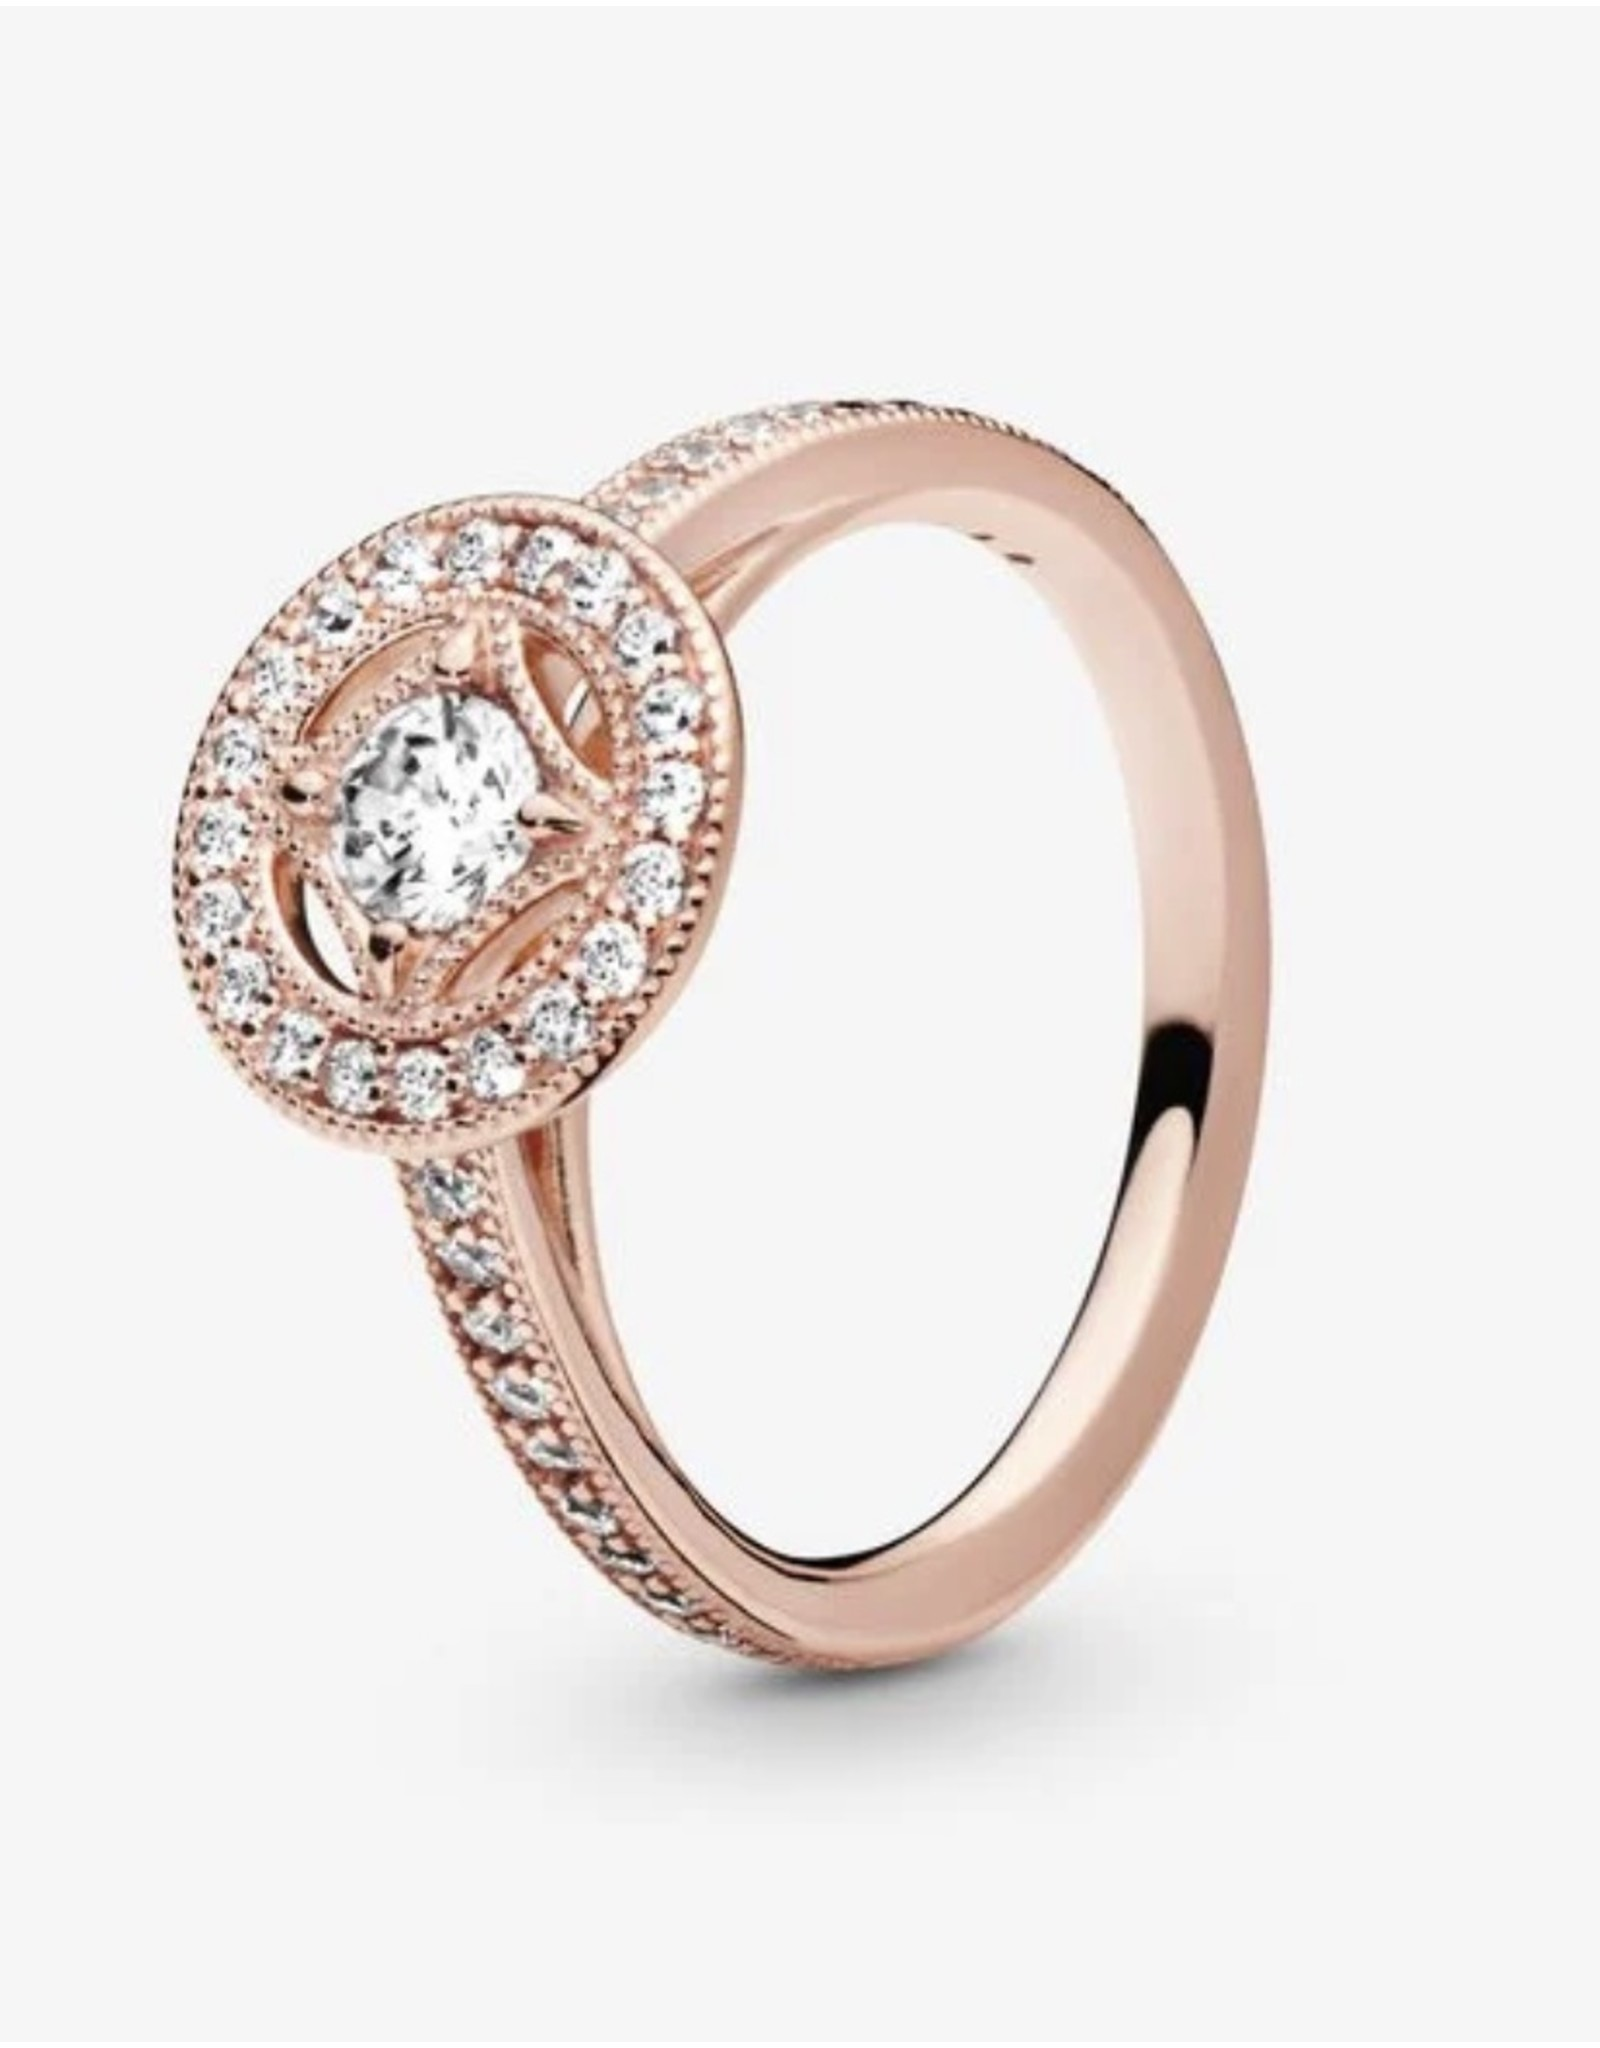 Pandora Pandora Ring, (181006CZ) Rose Gold, Vintage Allure, Clear CZ